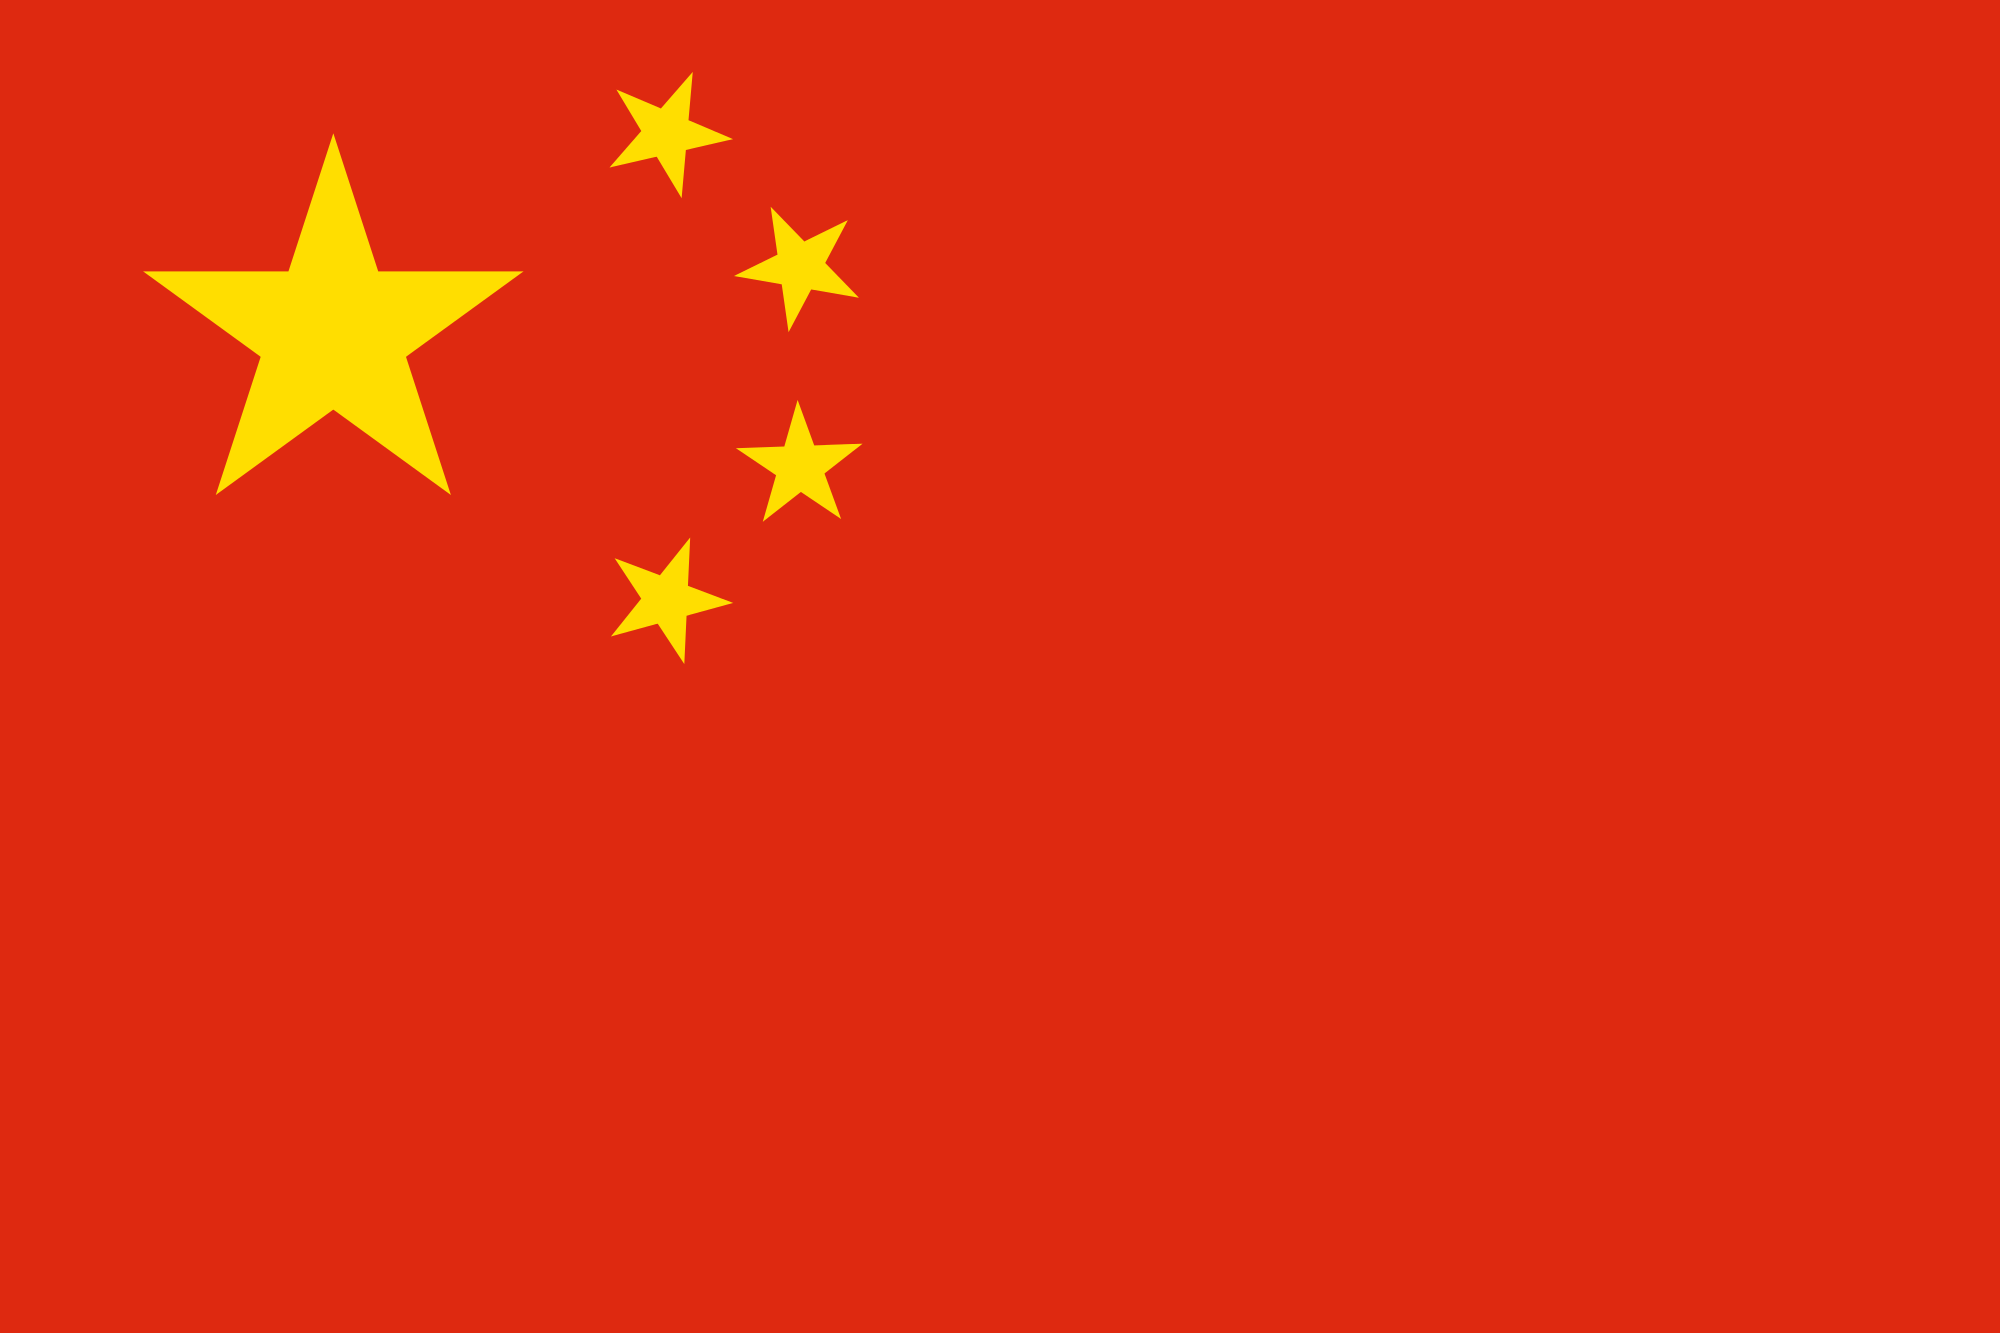 Chinesophobia